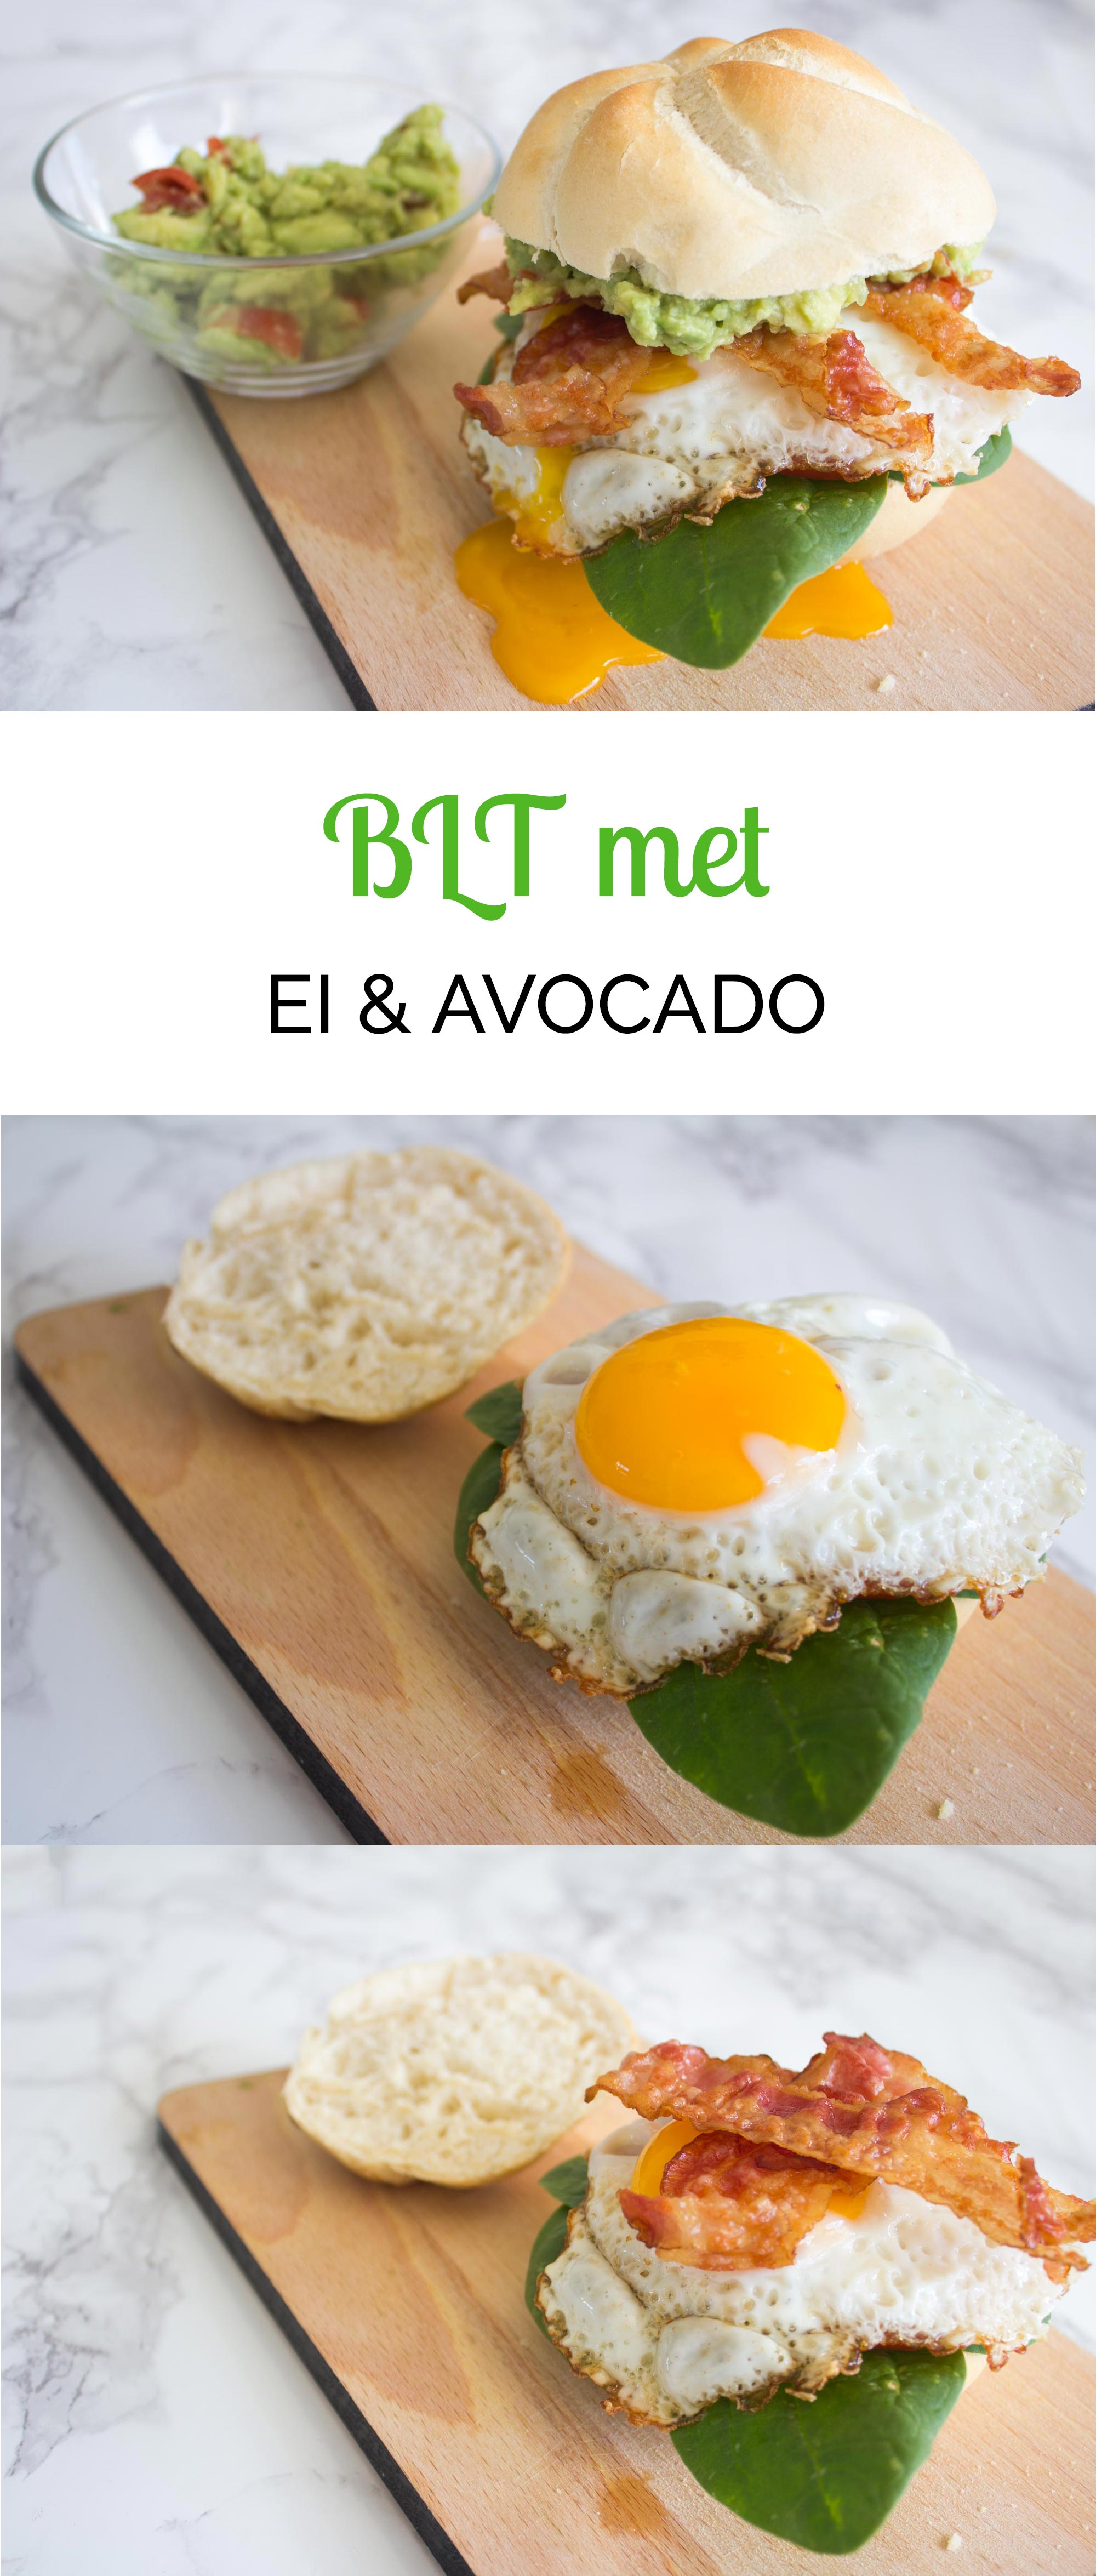 BLT met Ei & Avocado